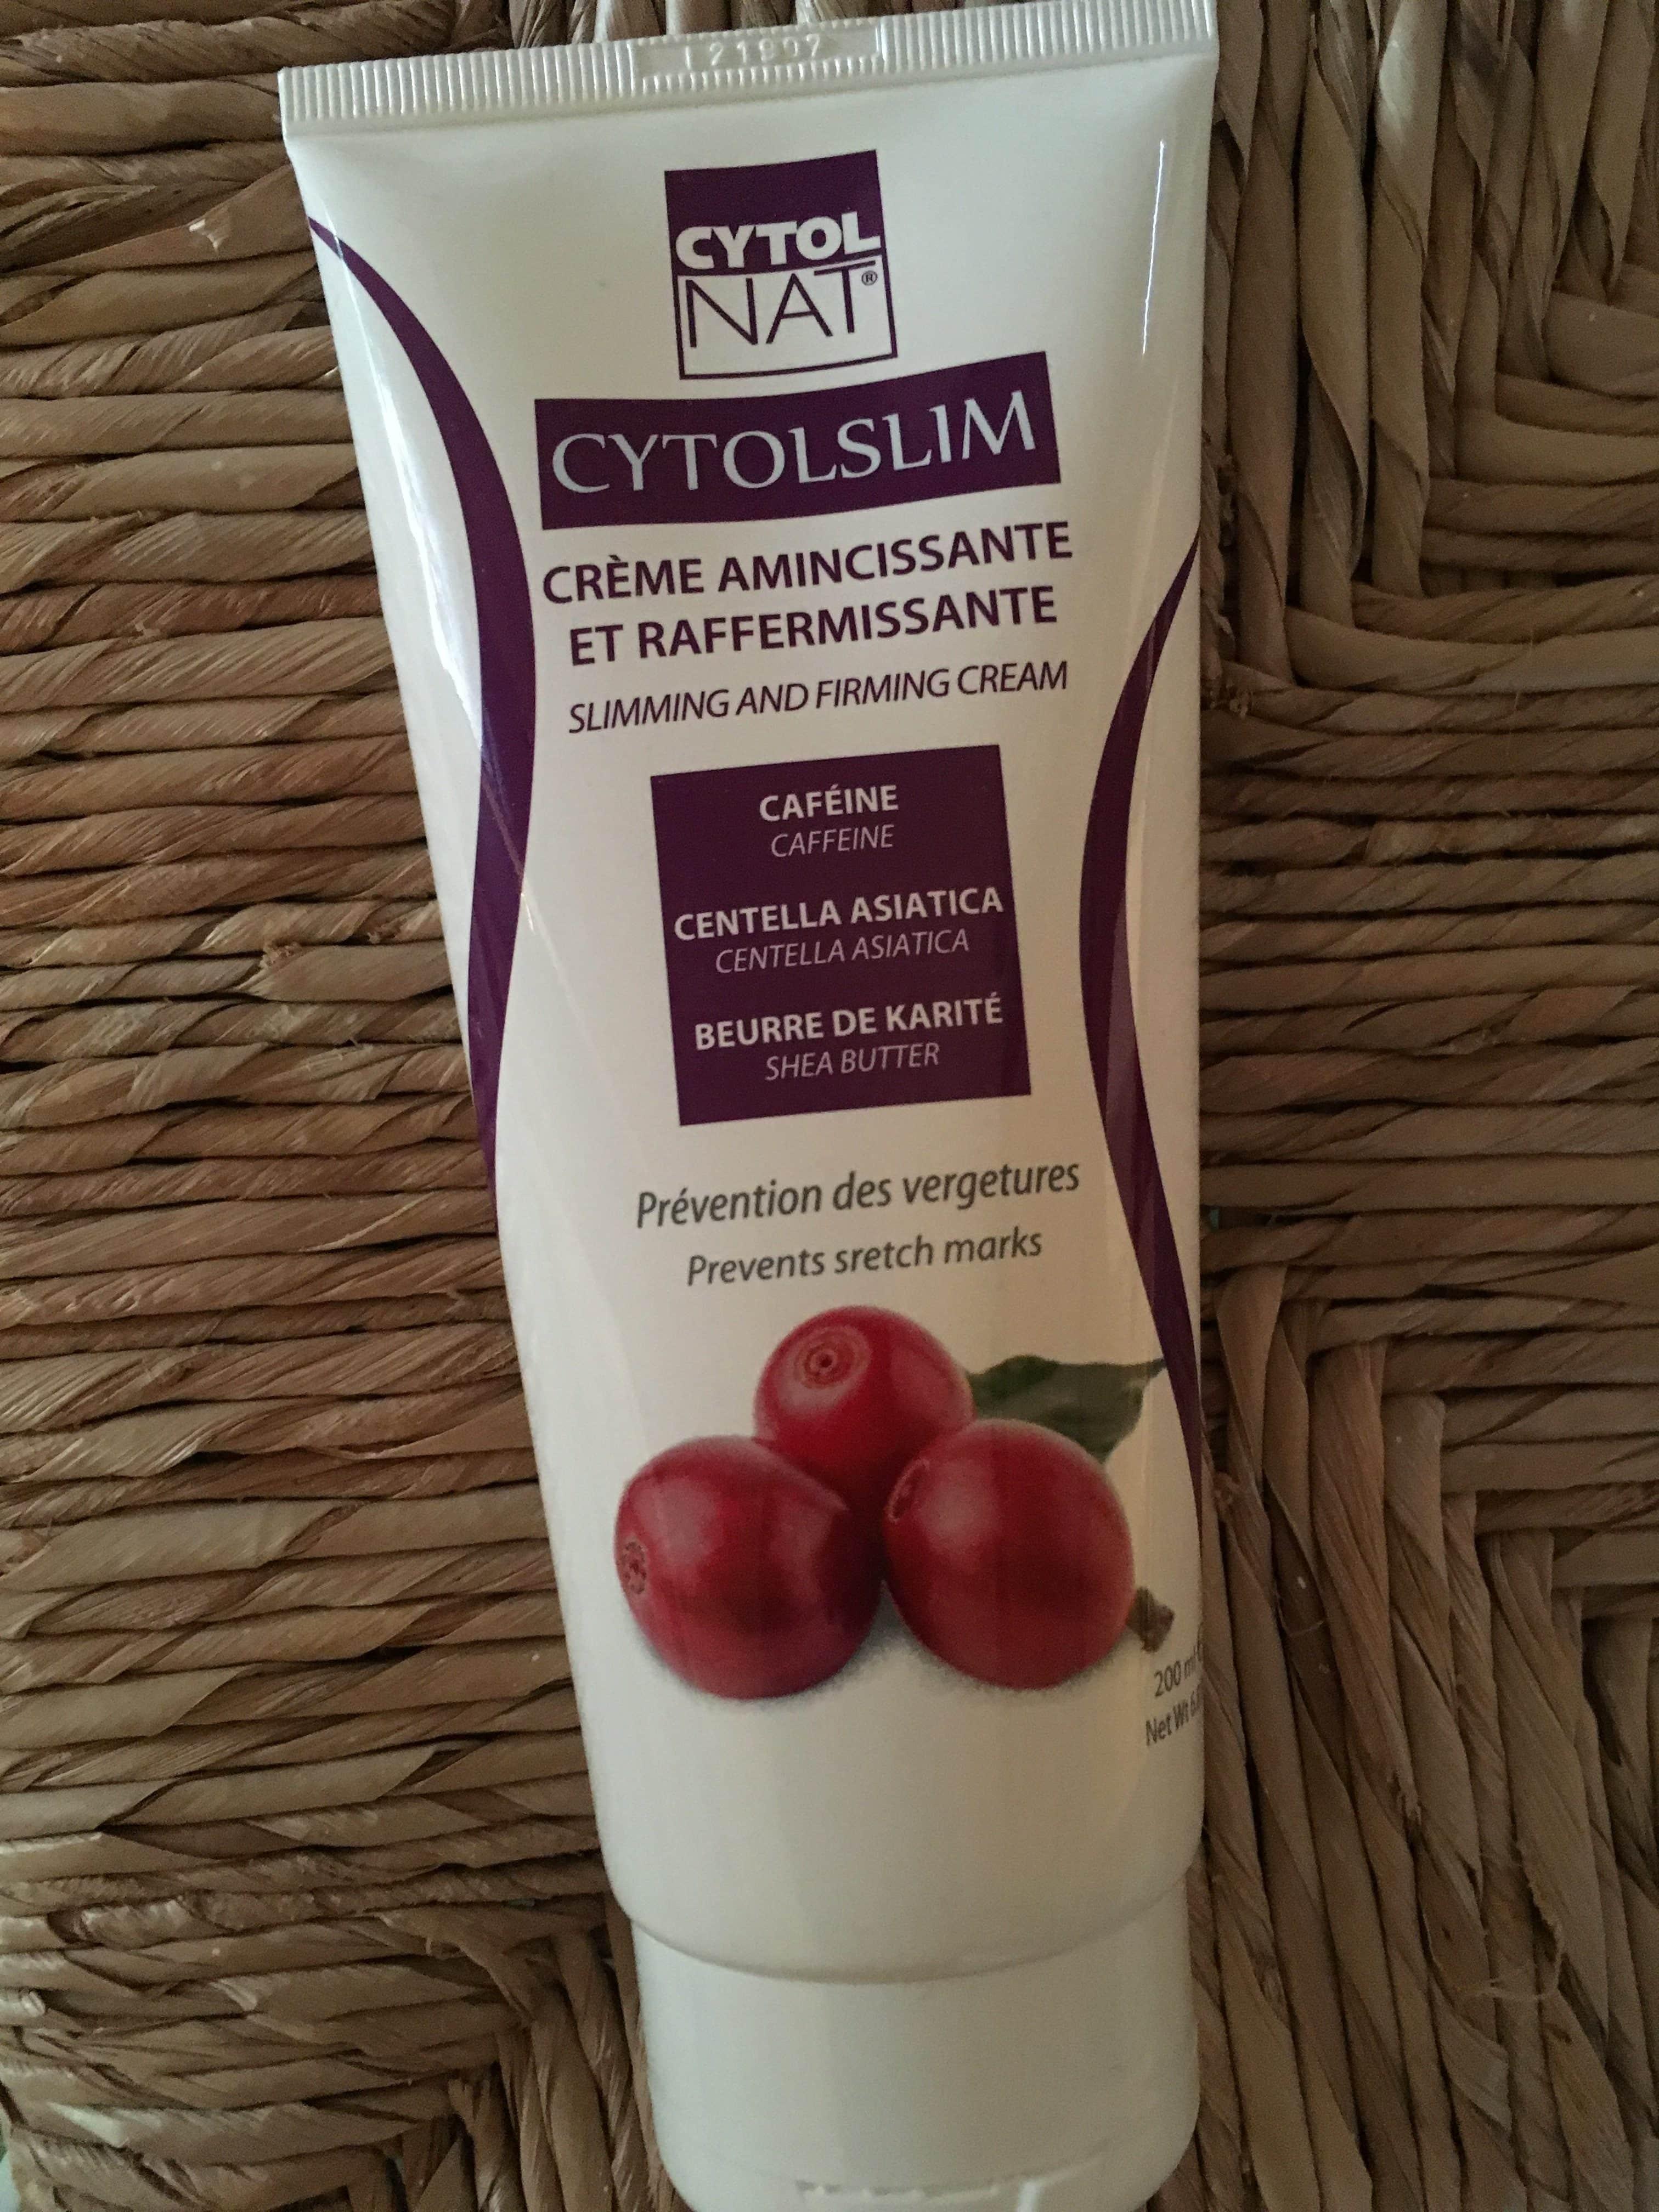 Cytolslim Cytolnat